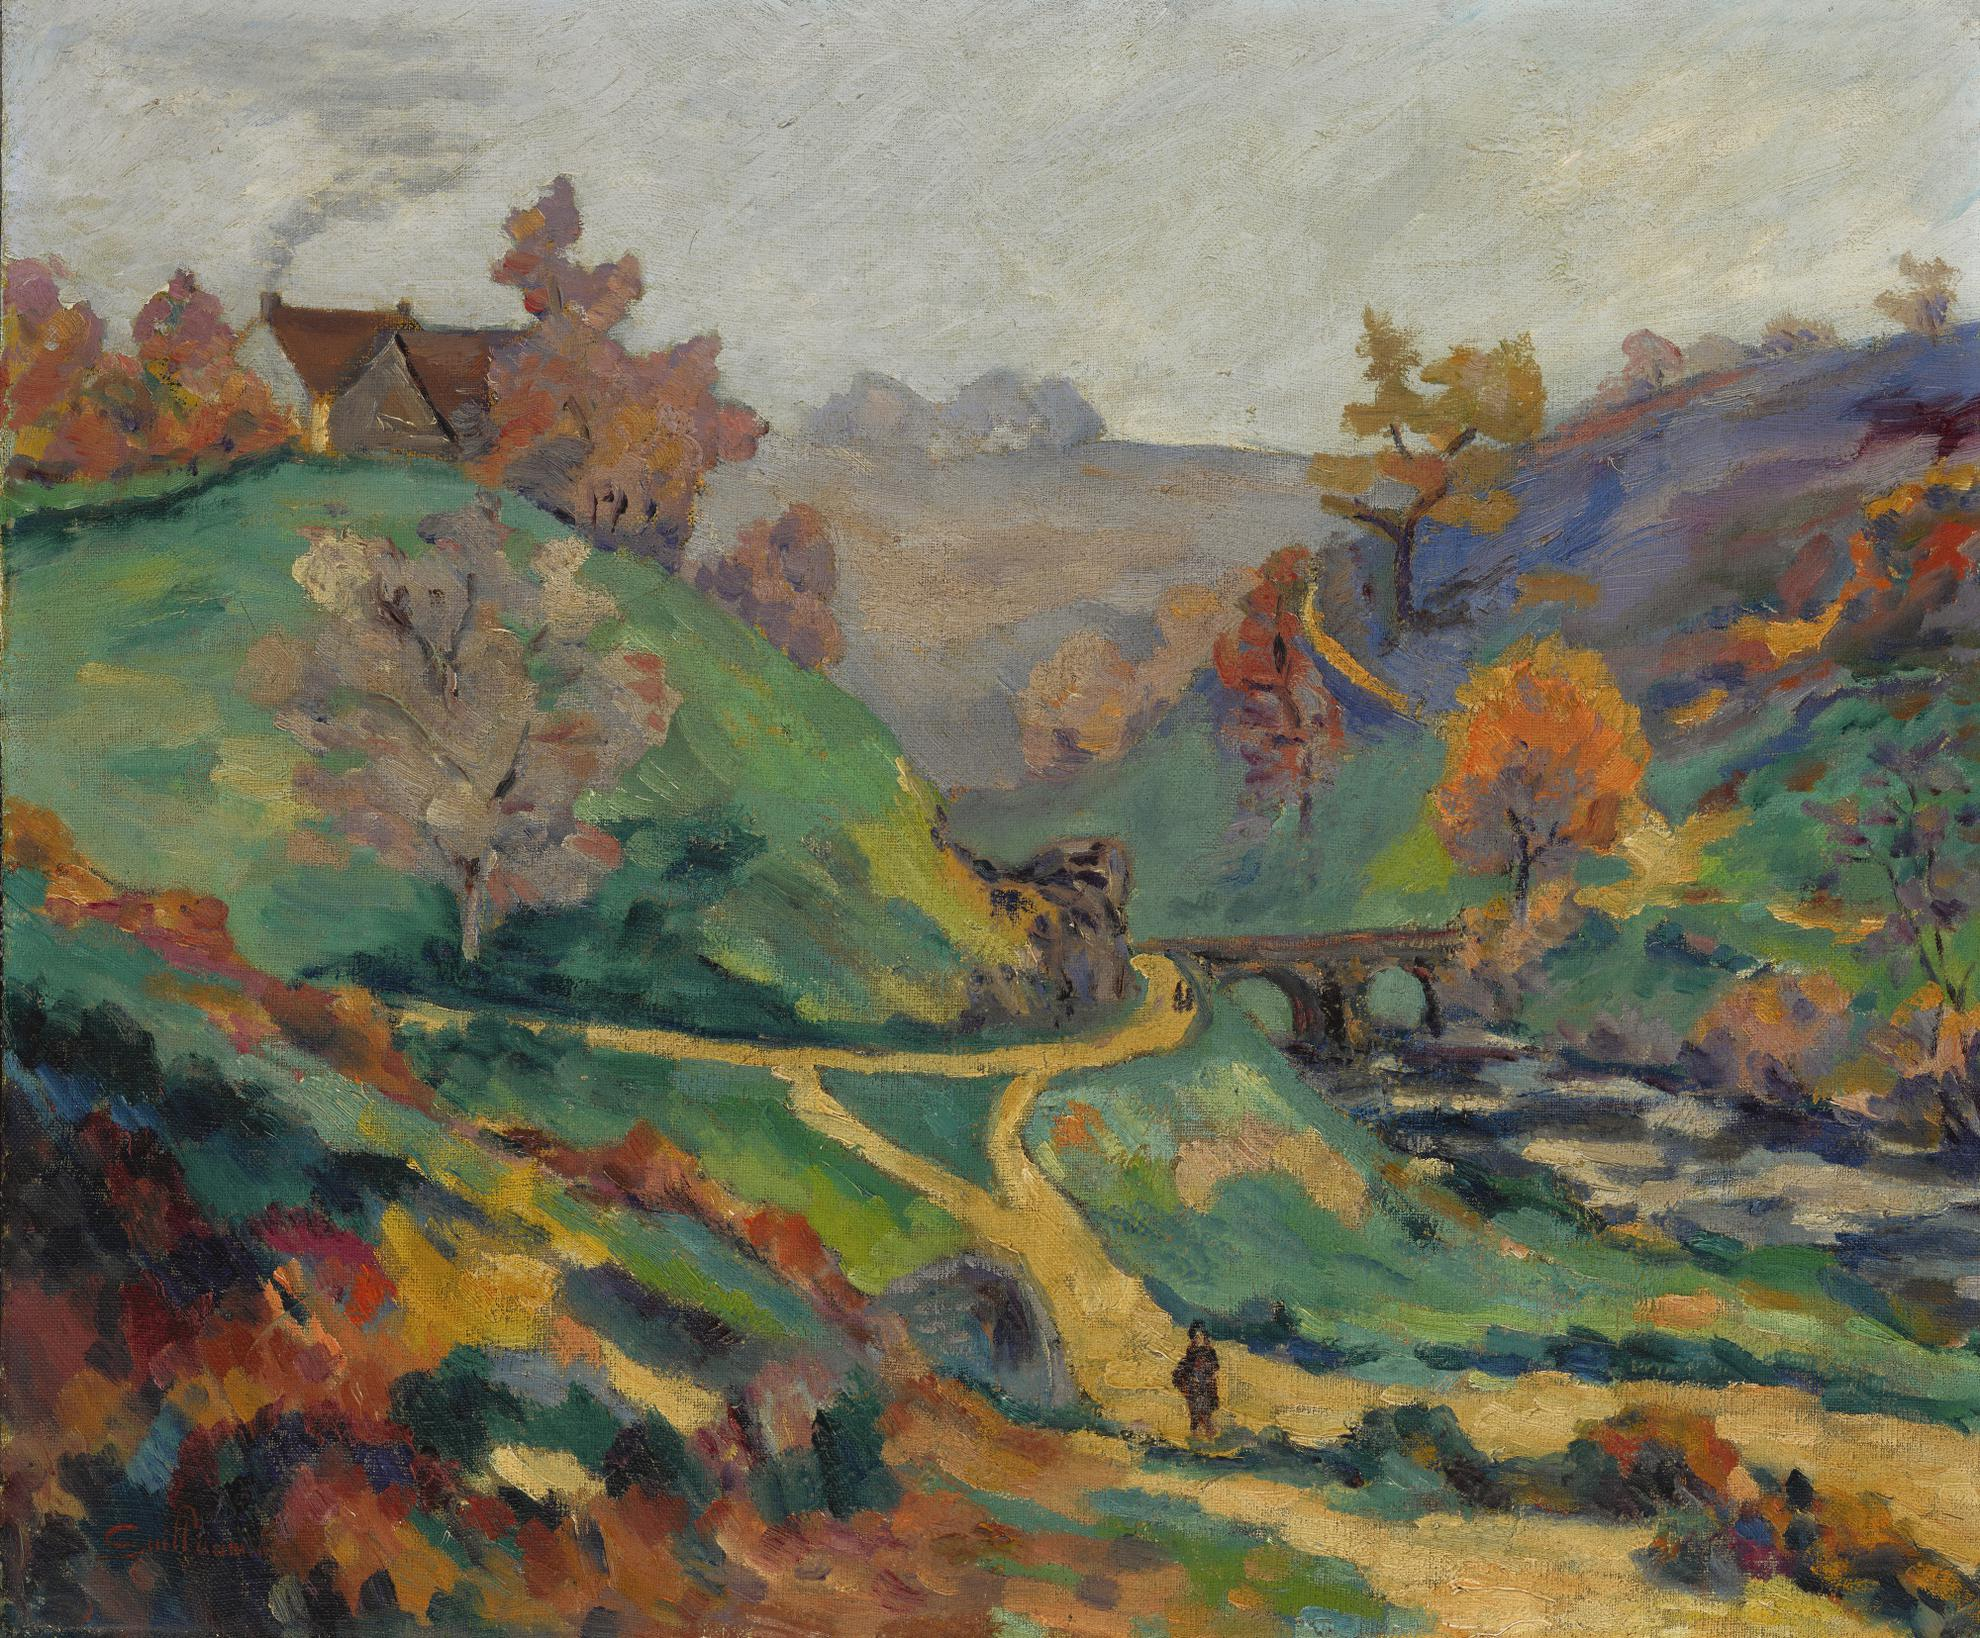 Jean-Baptiste Armand Guillaumin-La Sedelle Au Pont Charraud, Creuse-1916